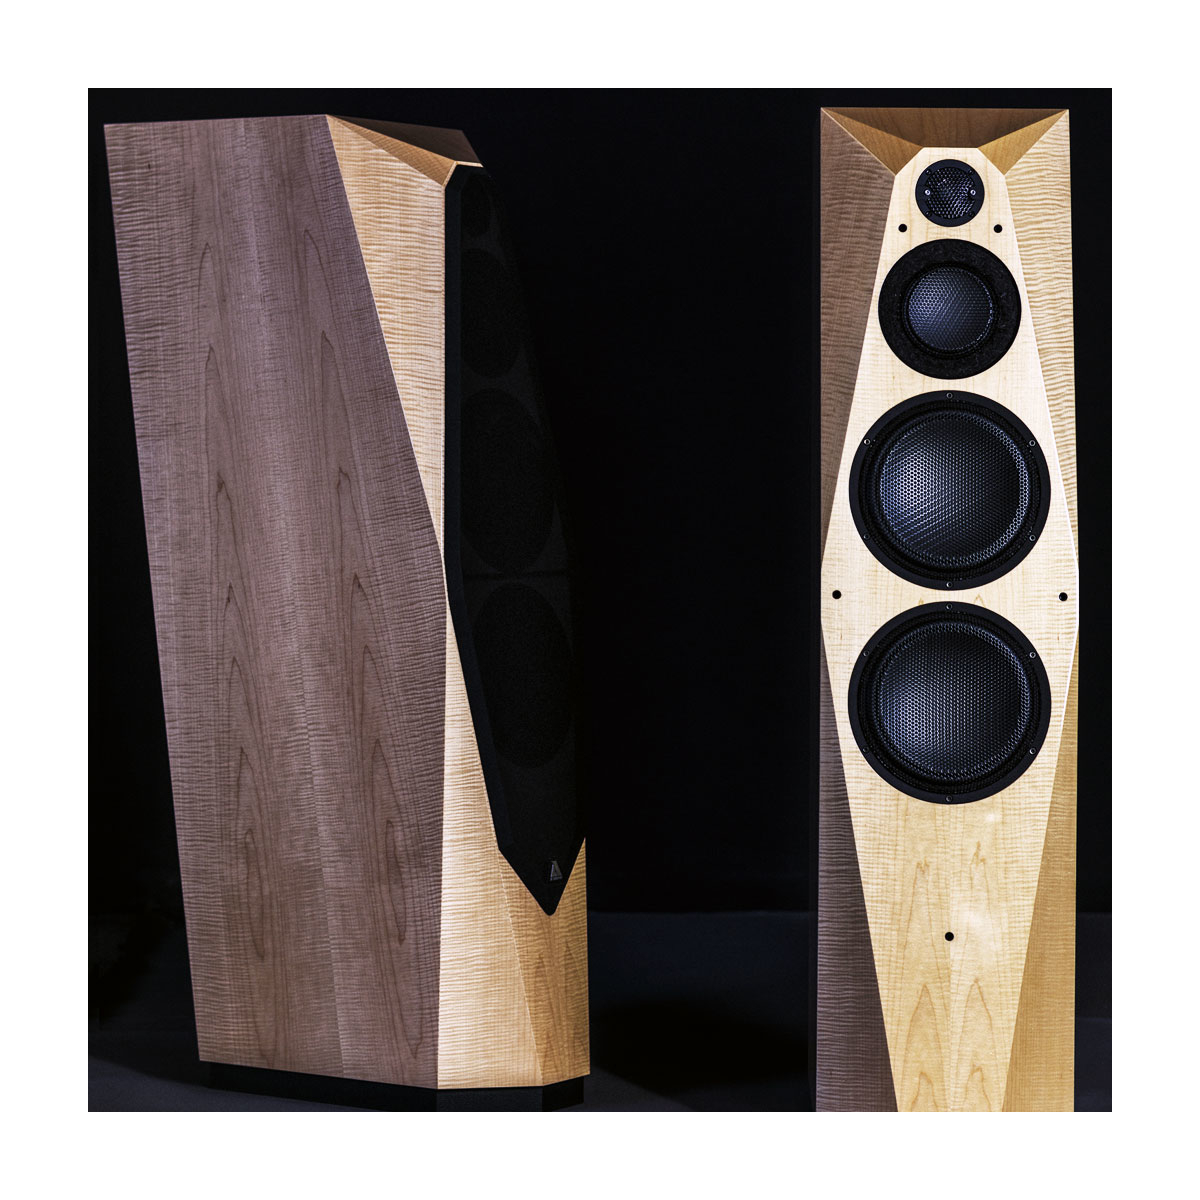 Avalon Acoustics Compas Diamond Maple 特別価格ASK! アヴァロン スピーカーシステム ペア